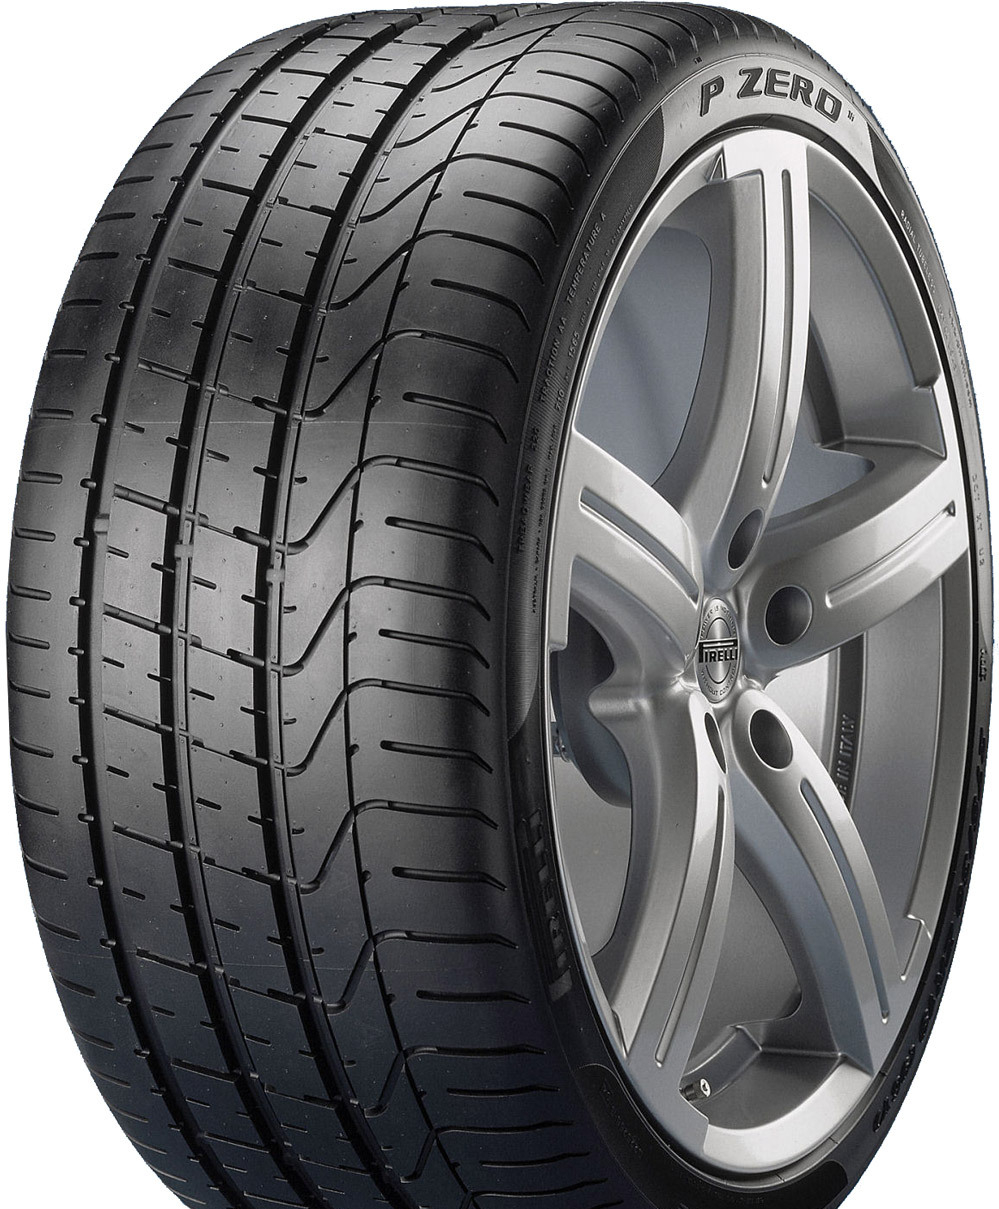 Автомобильные шины Pirelli P Zero 275/35R20 102Y